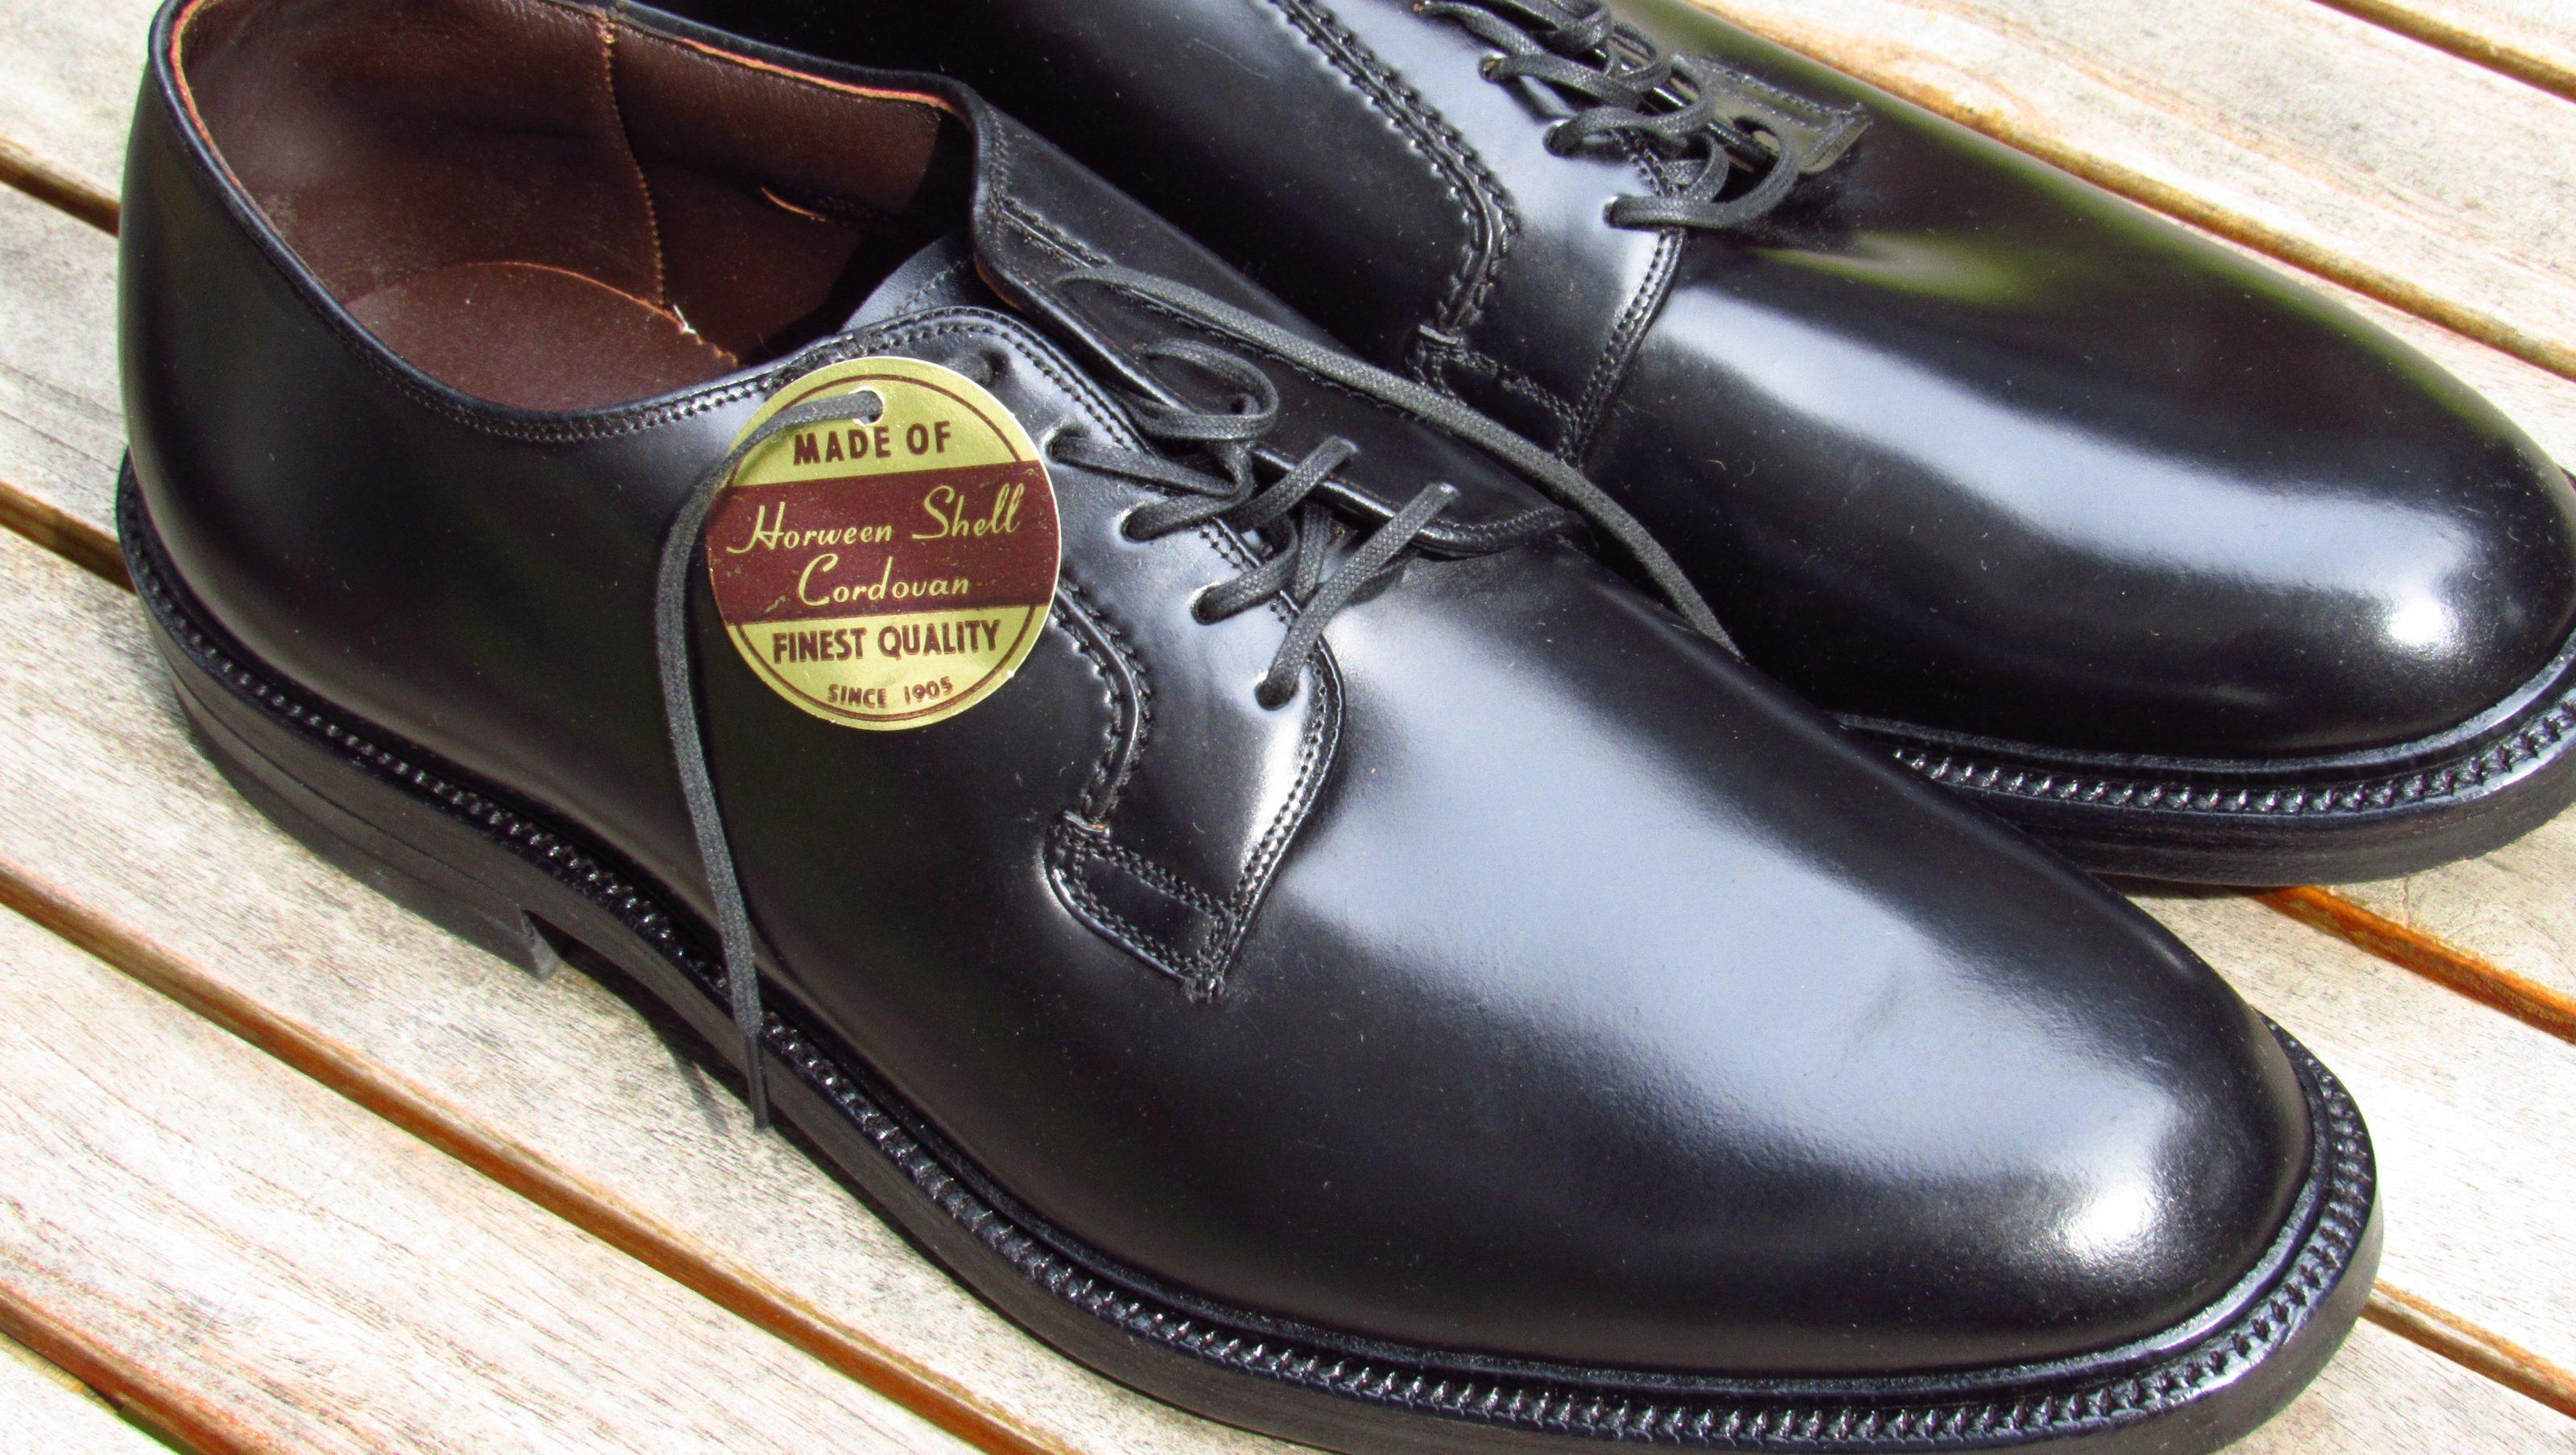 dating hanover shoes singles aus plauen